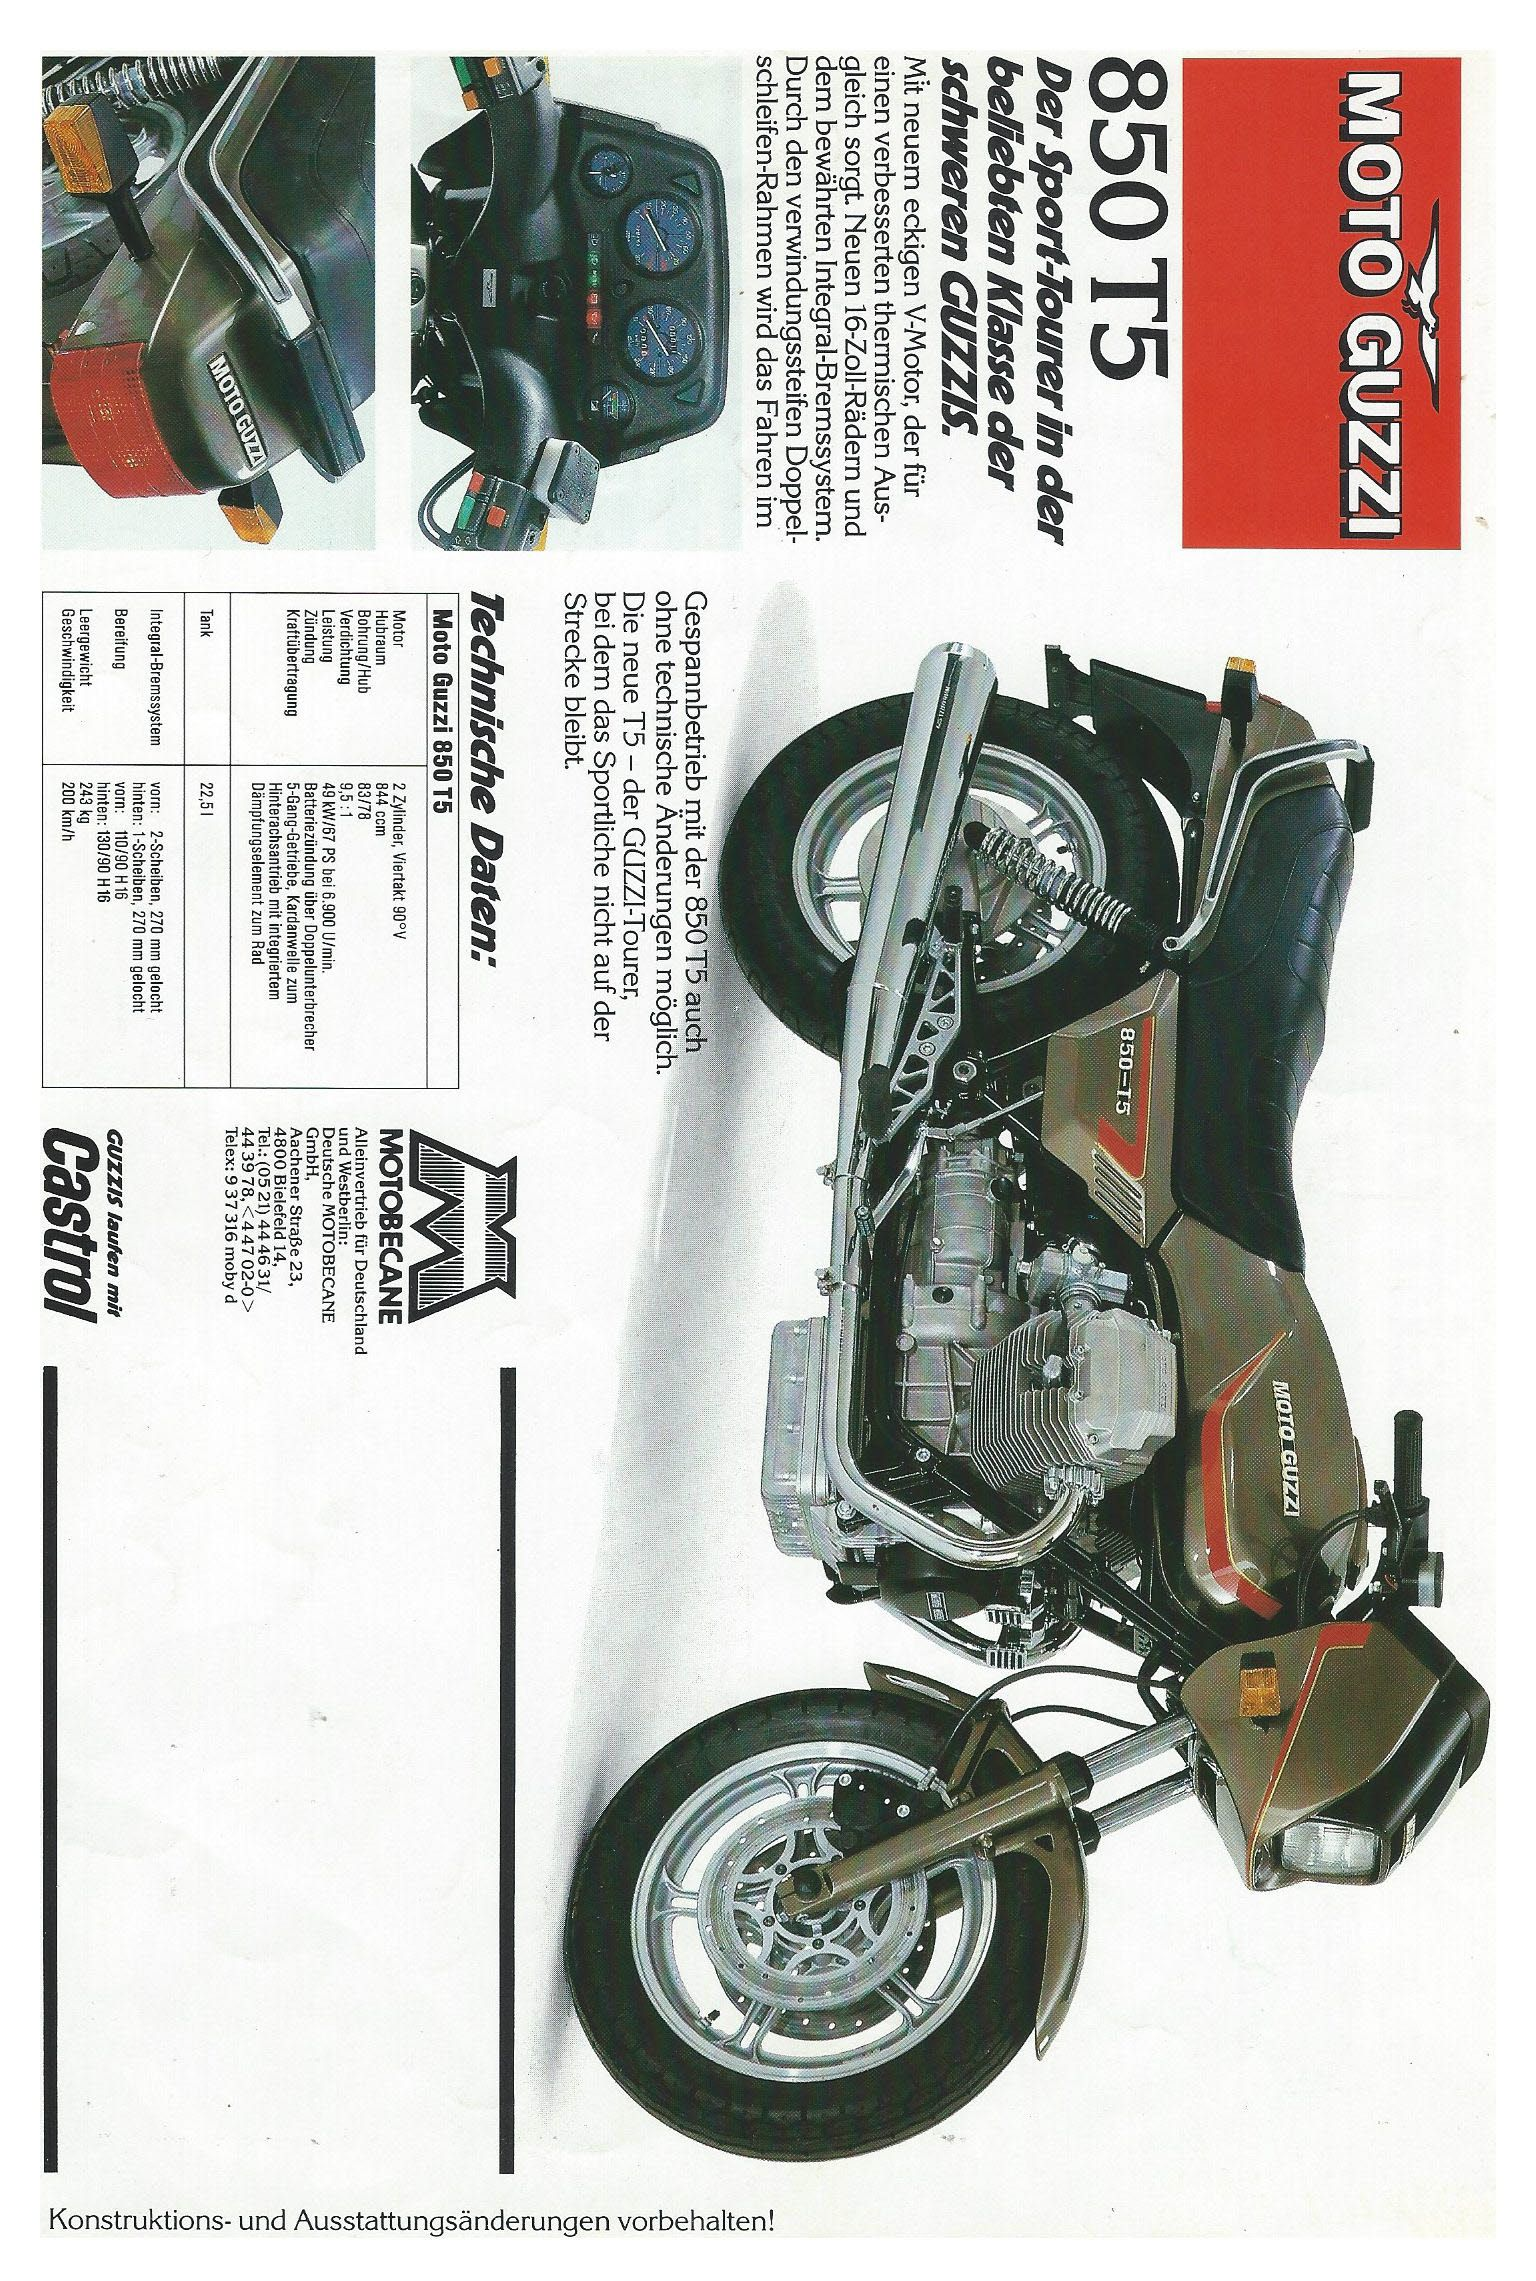 Moto Guzzi California Ii 850t5 Brochure 4 Moto Guzzi Moto